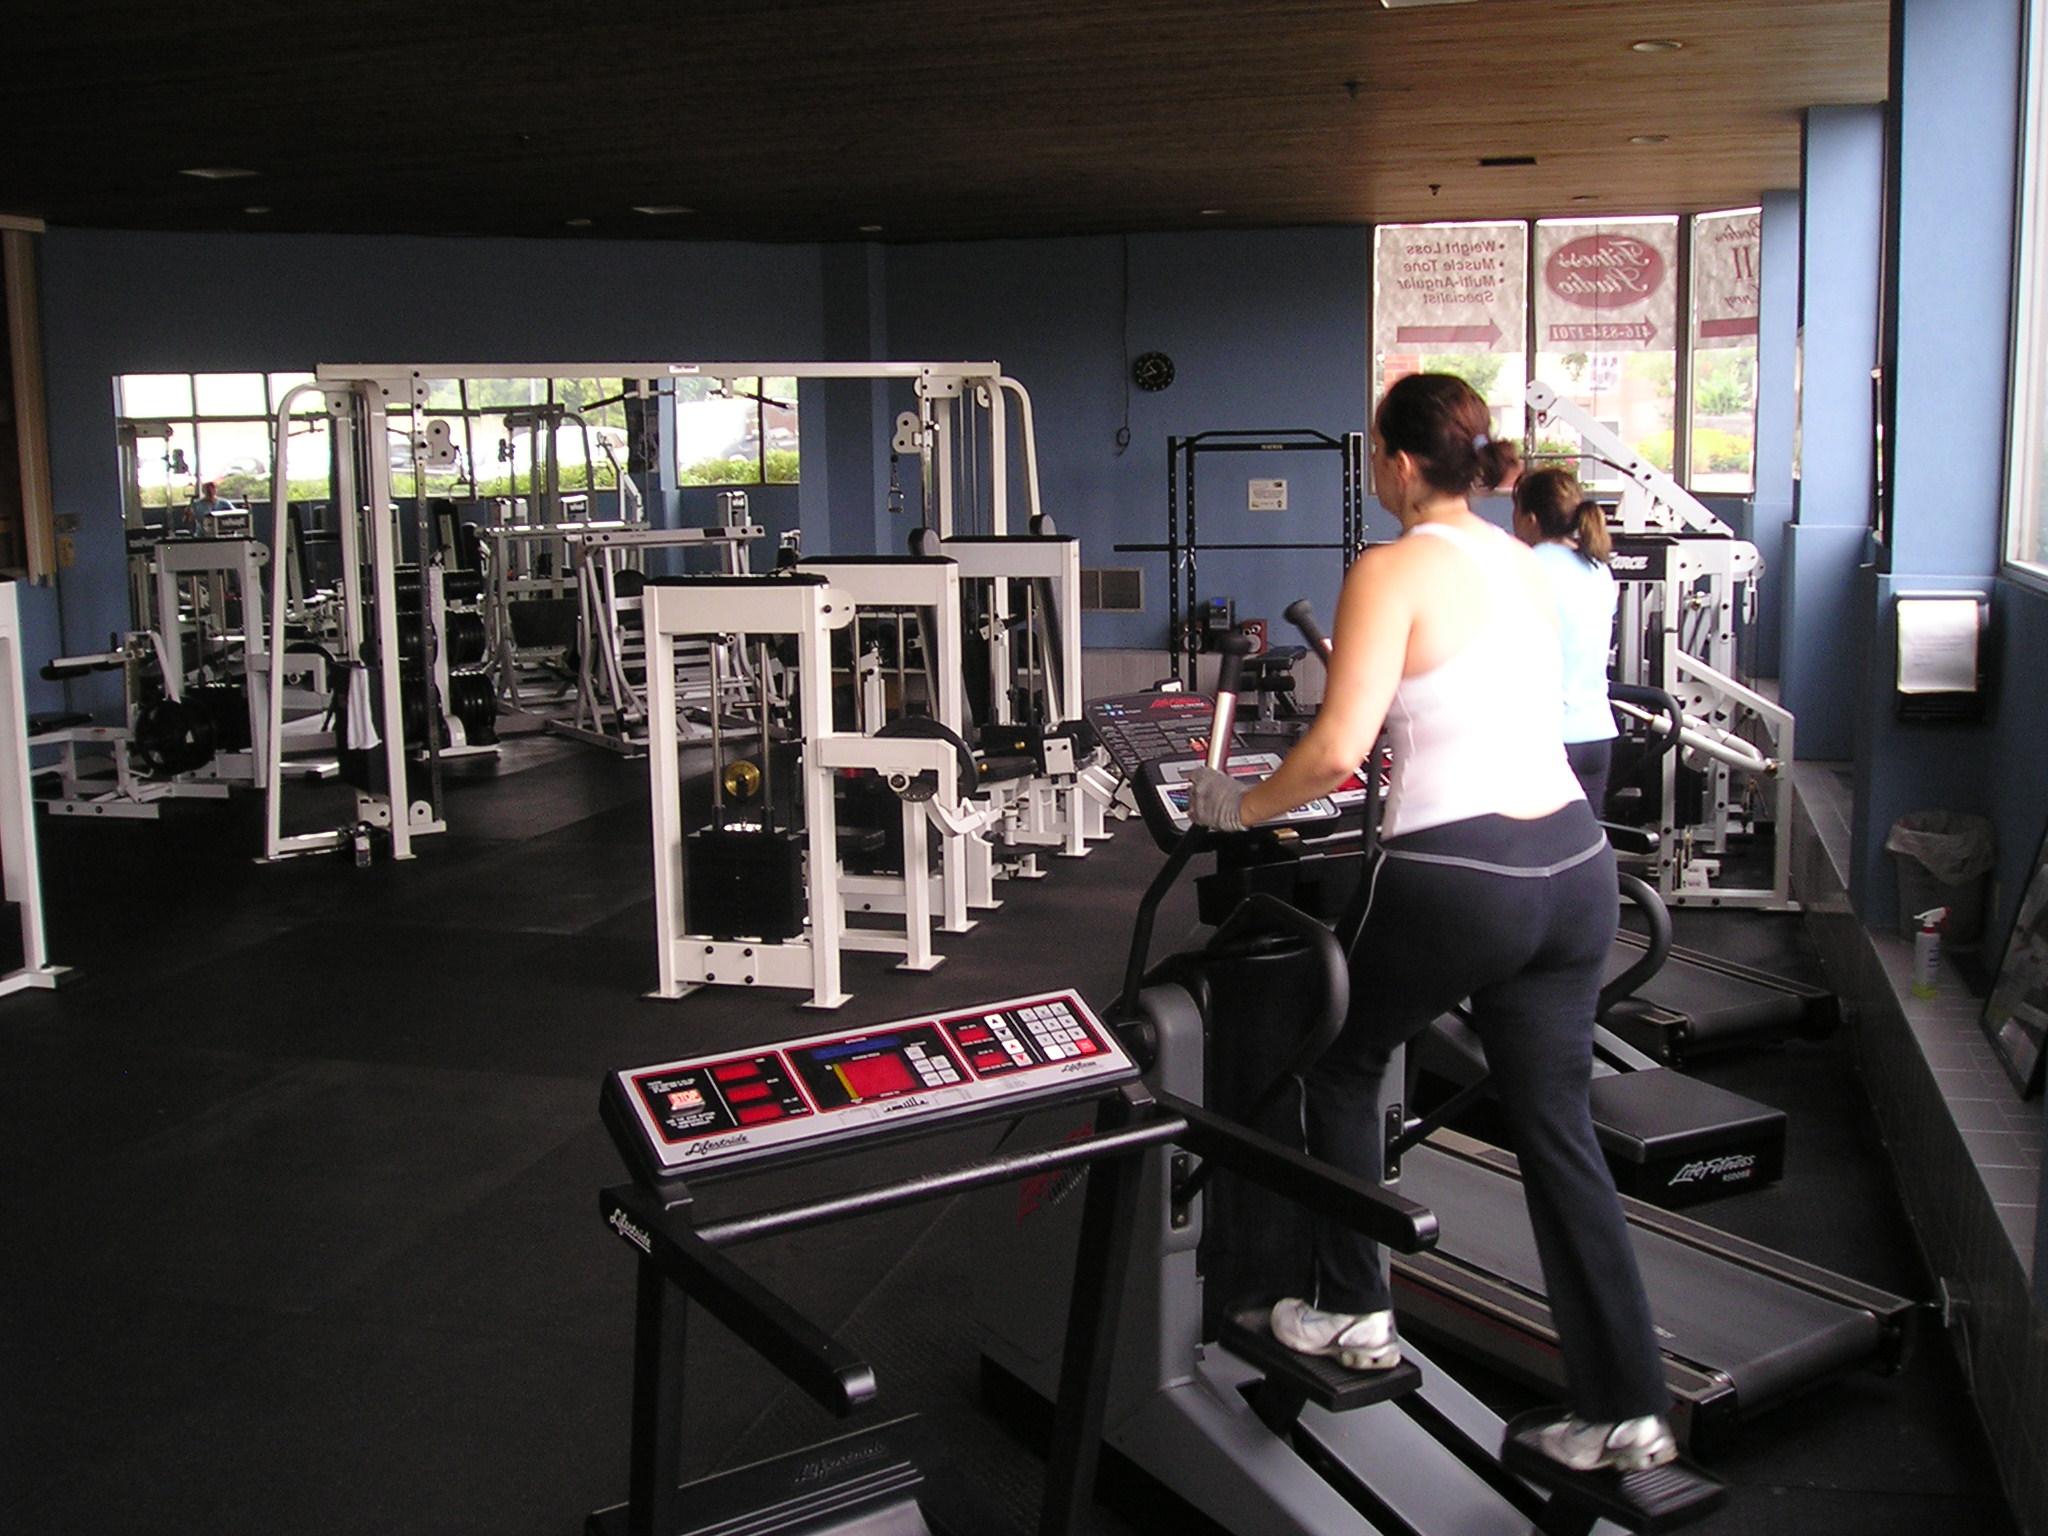 Bodies 2 Envy Fitness Studio - Cardiovascular